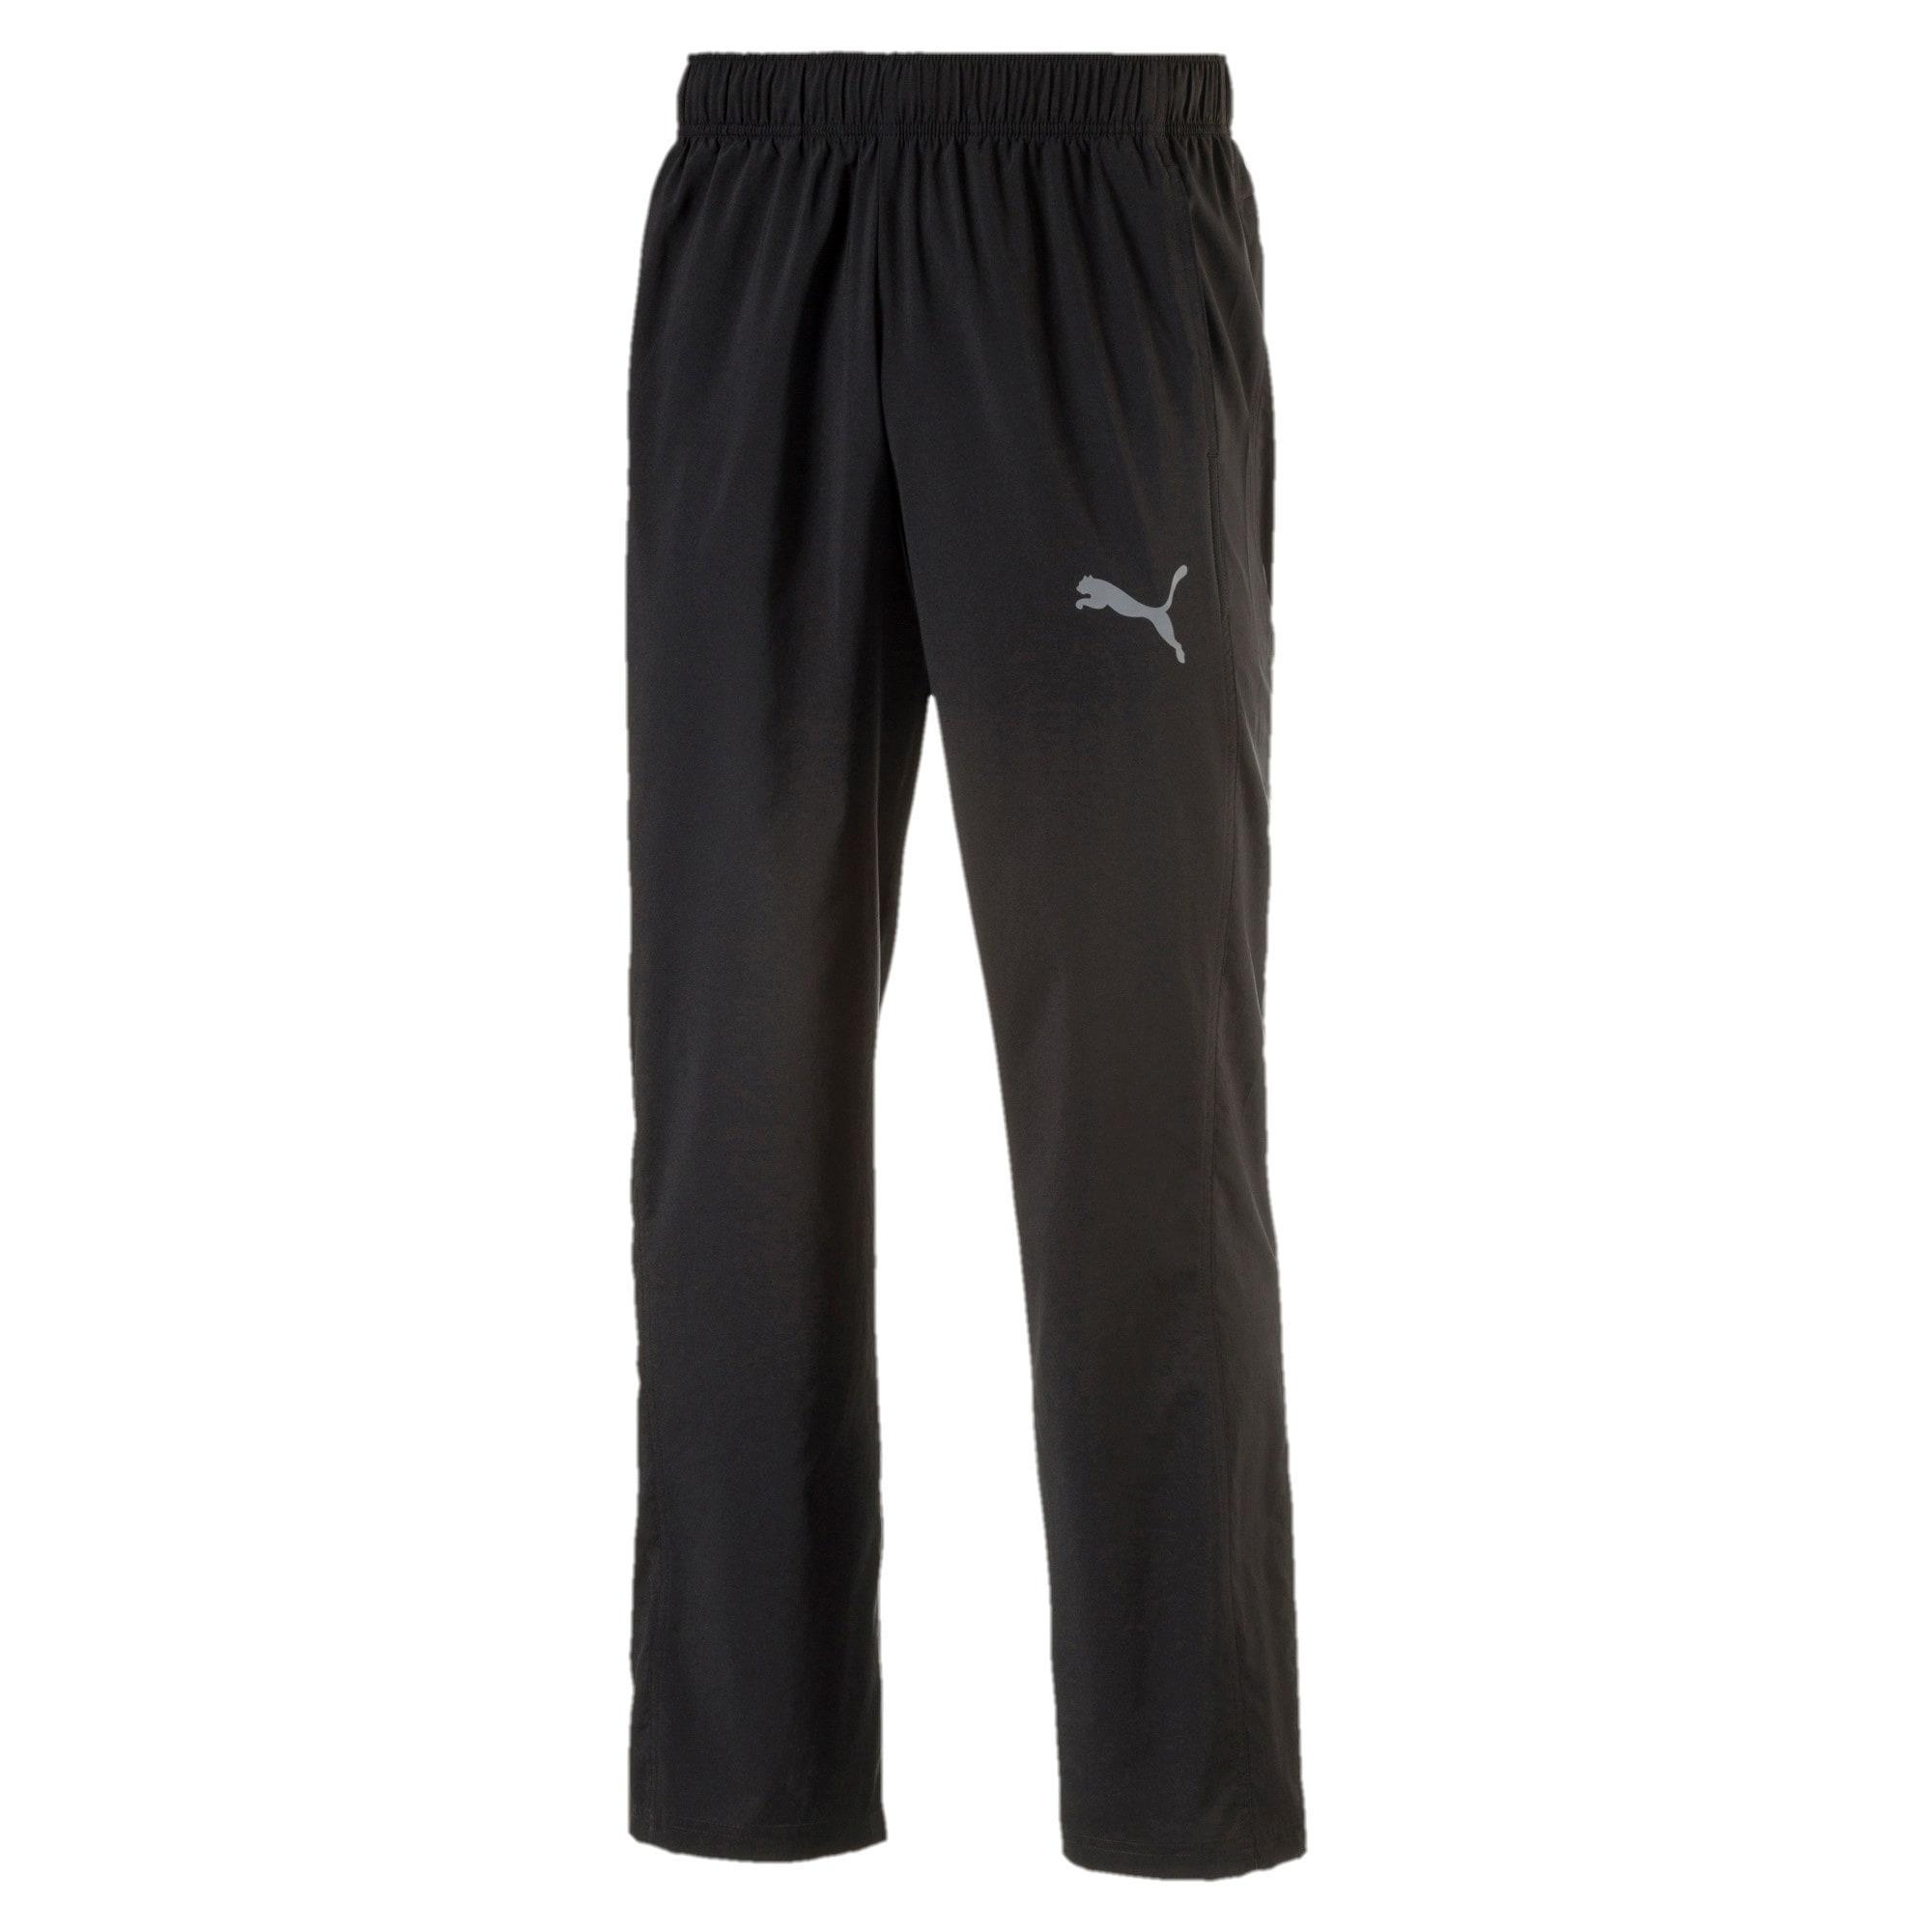 Thumbnail 3 of Essential Woven Pant, Puma Black, medium-IND